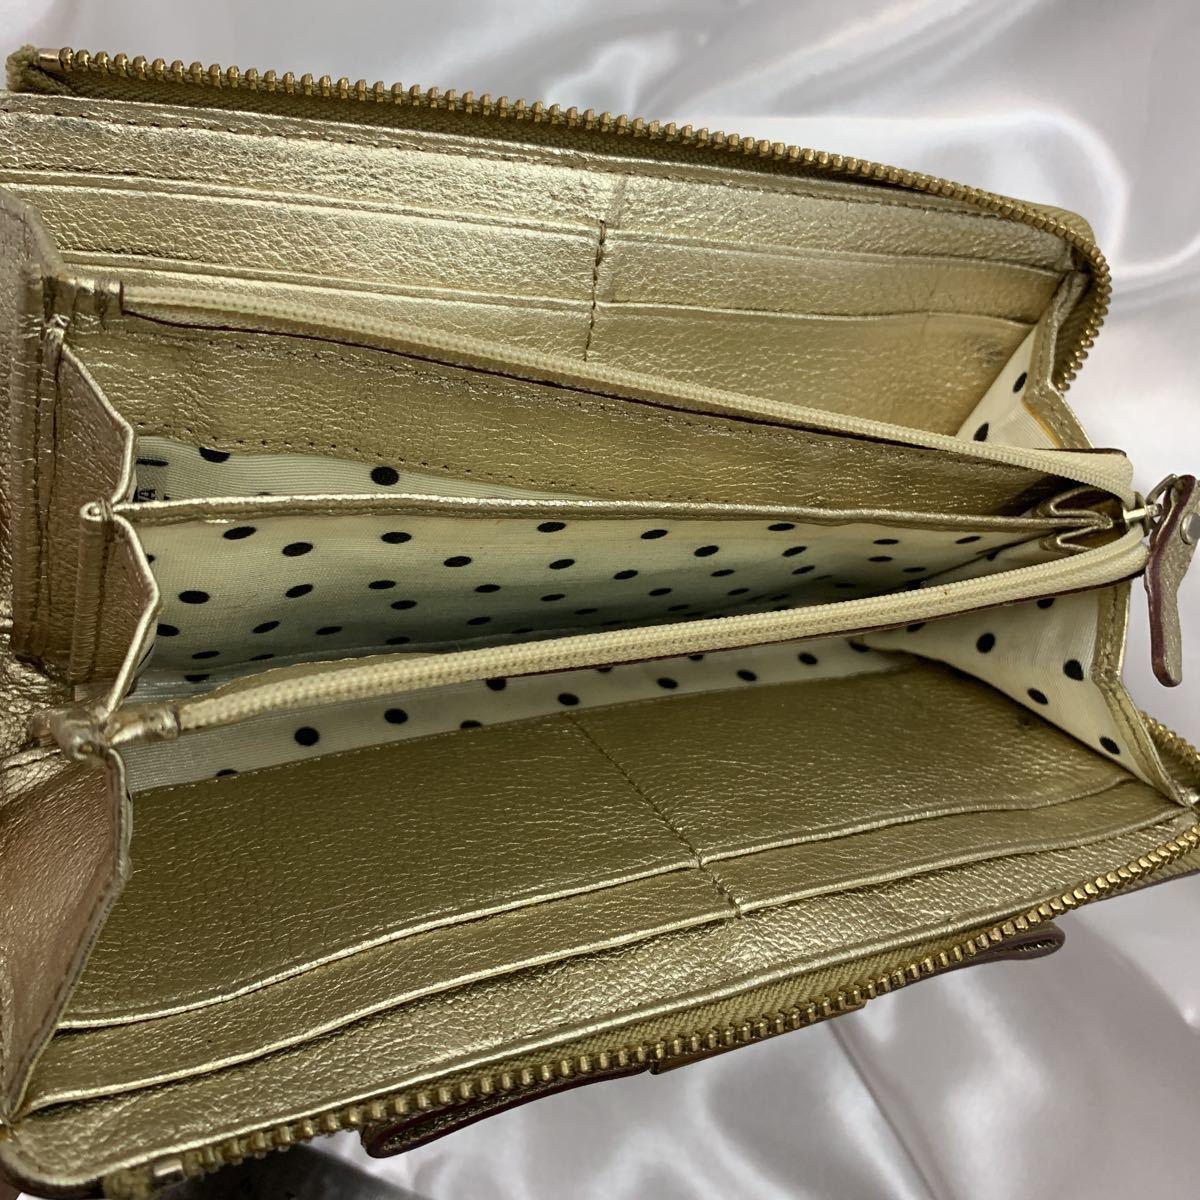 【WL18】ケイトスペード kate spade ラウンドファスナー ラメゴールド 長財布 内側ドット柄 リボン装飾 小銭入れ